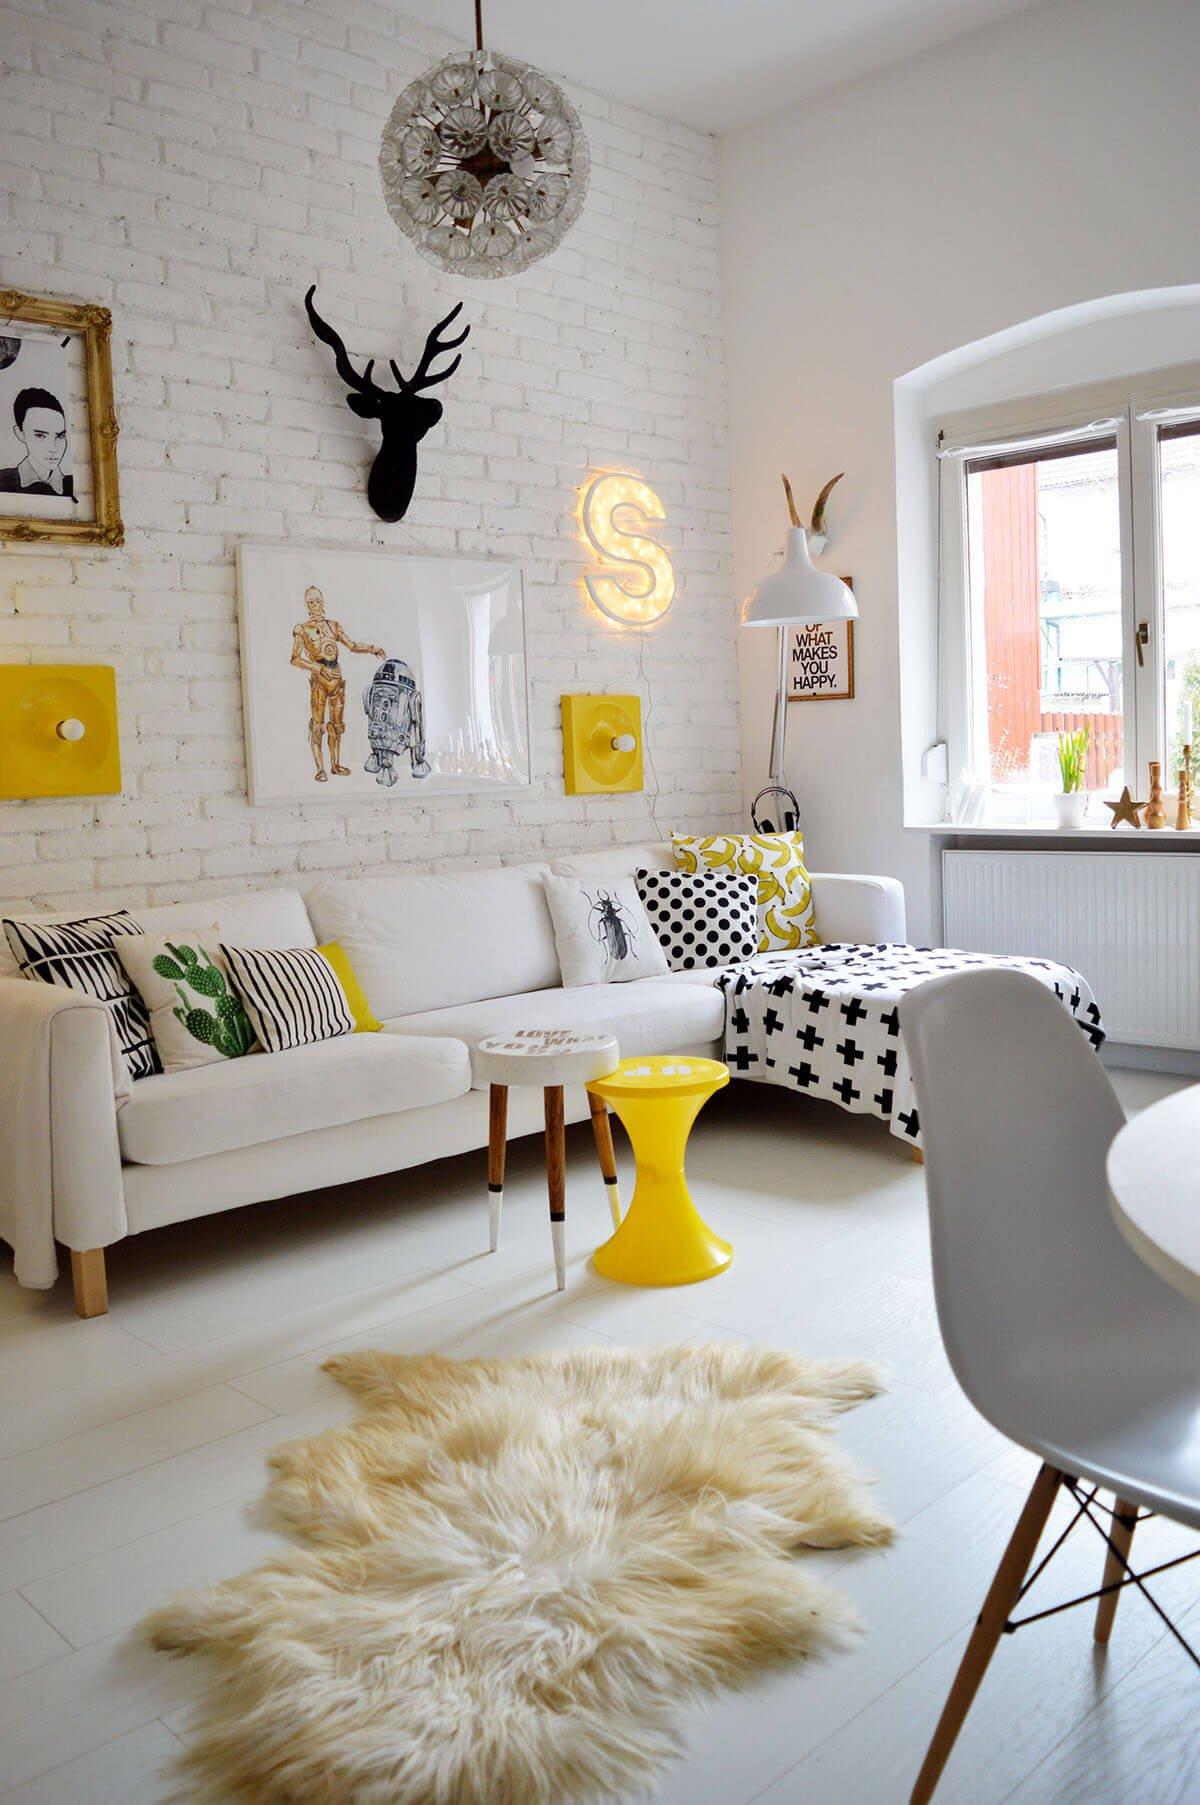 Fun Living Room Decorating Ideas Fresh 25 Best Small Living Room Decor and Design Ideas for 2019